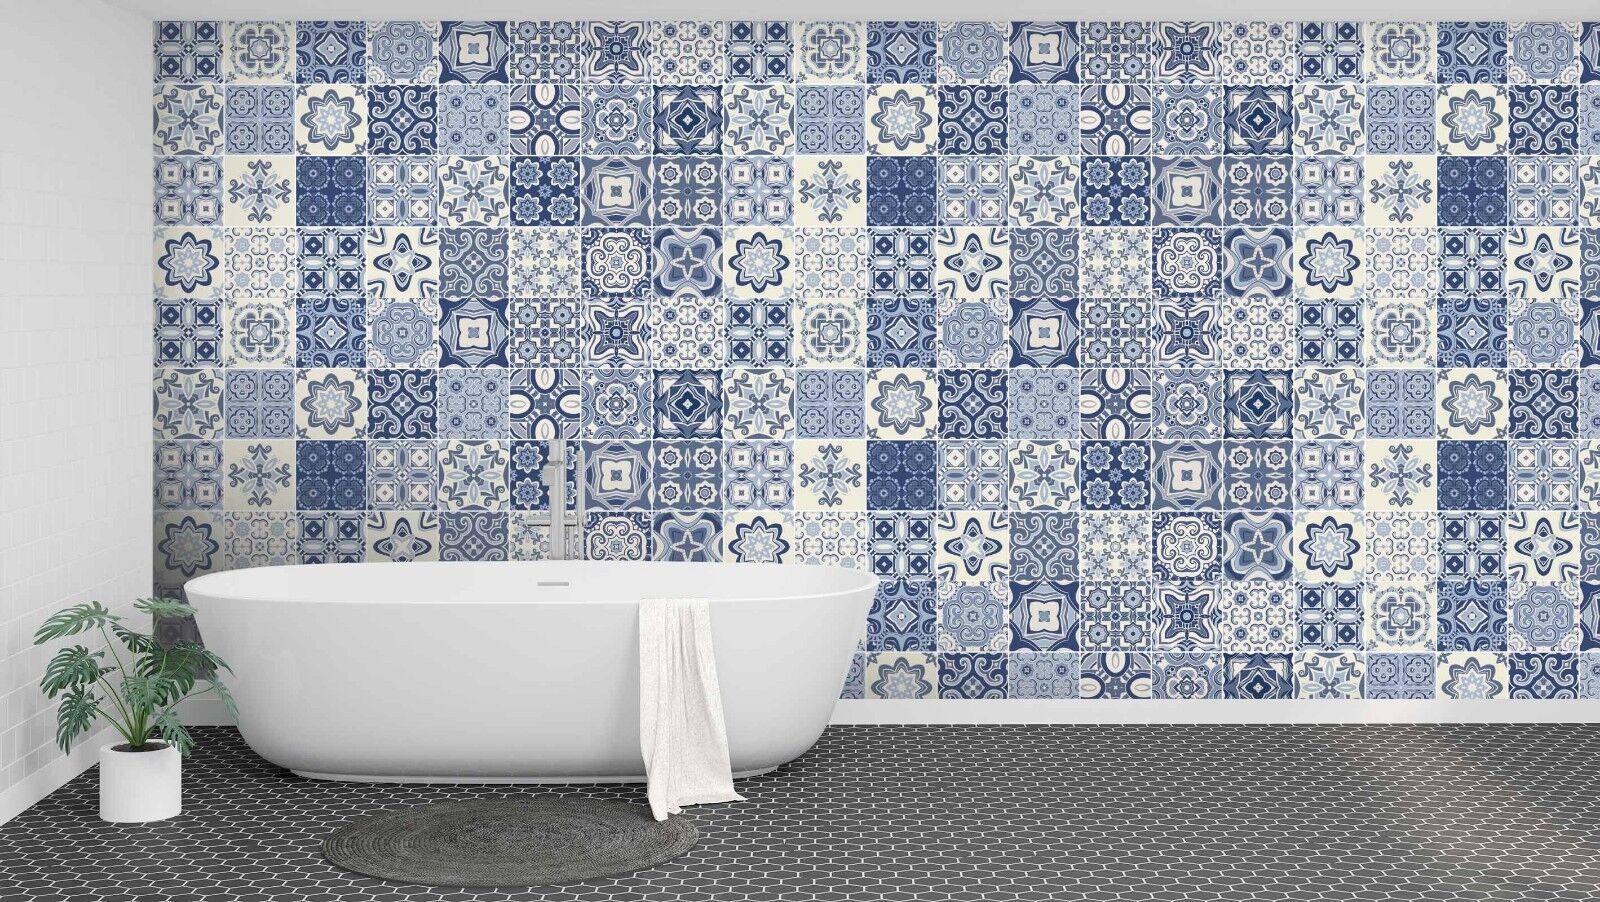 3D Ordentliche Blaume 6515 Textur Fliesen Marmor Tapeten Tapete Wandbild AJ